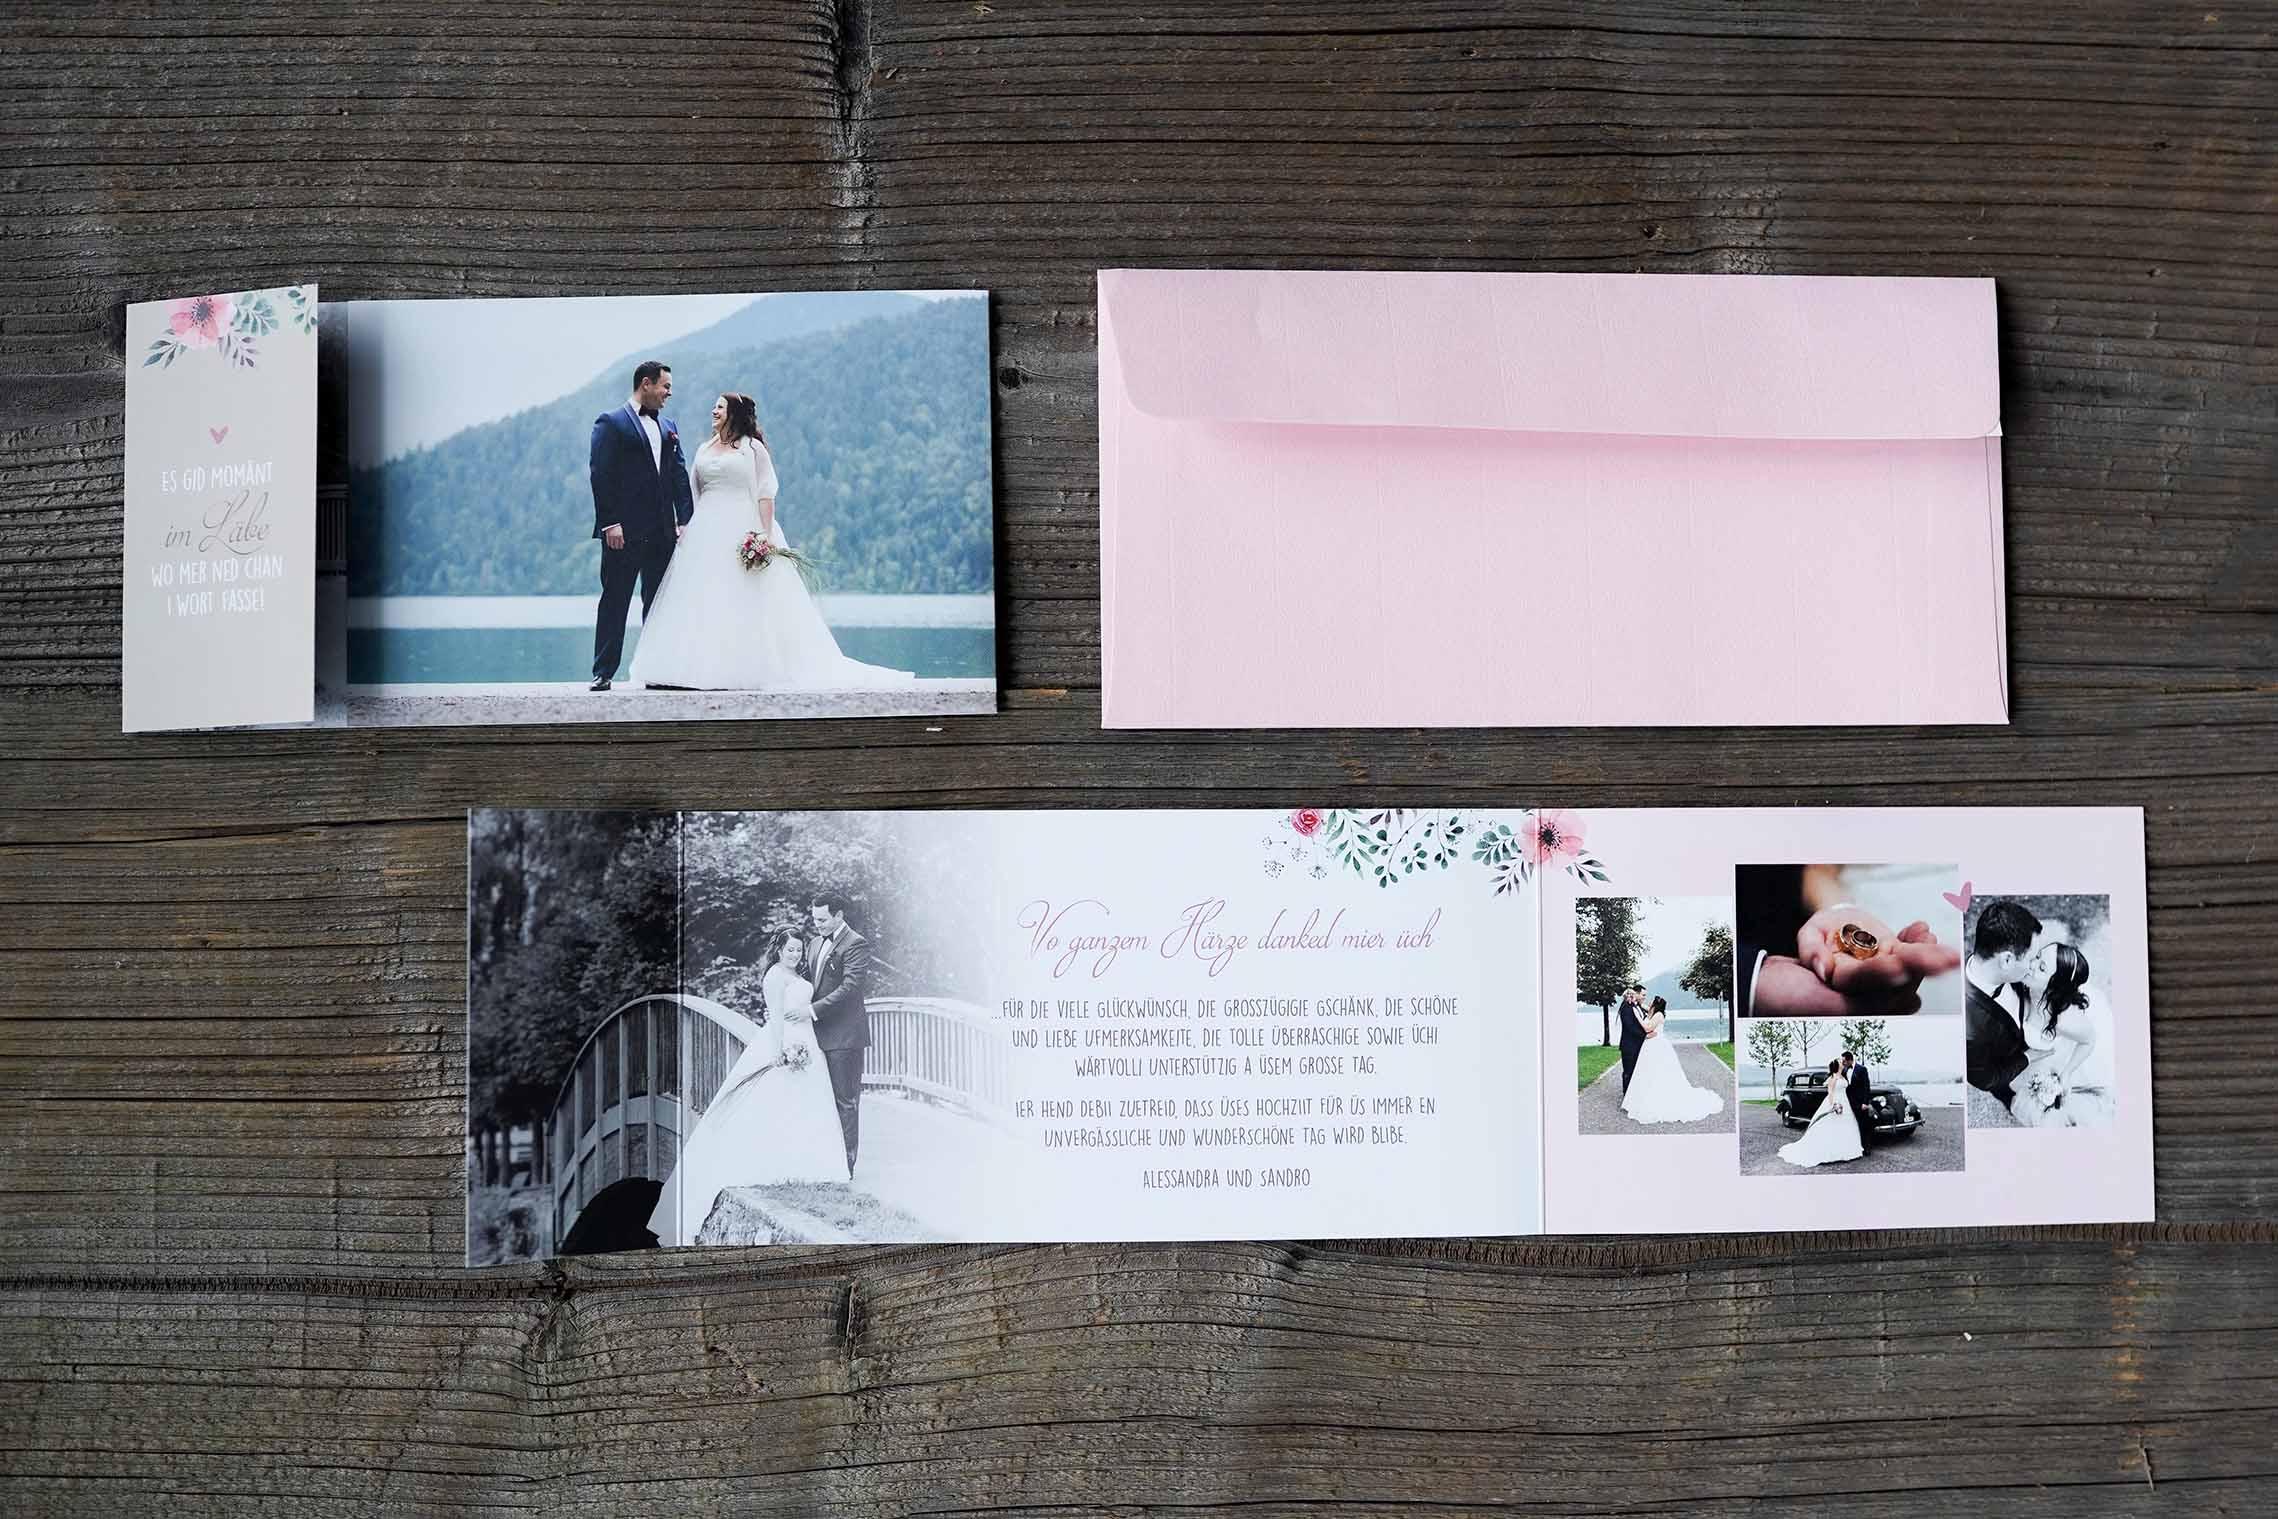 Hochzeitsdankeskarte Sando & Alessandraro &A